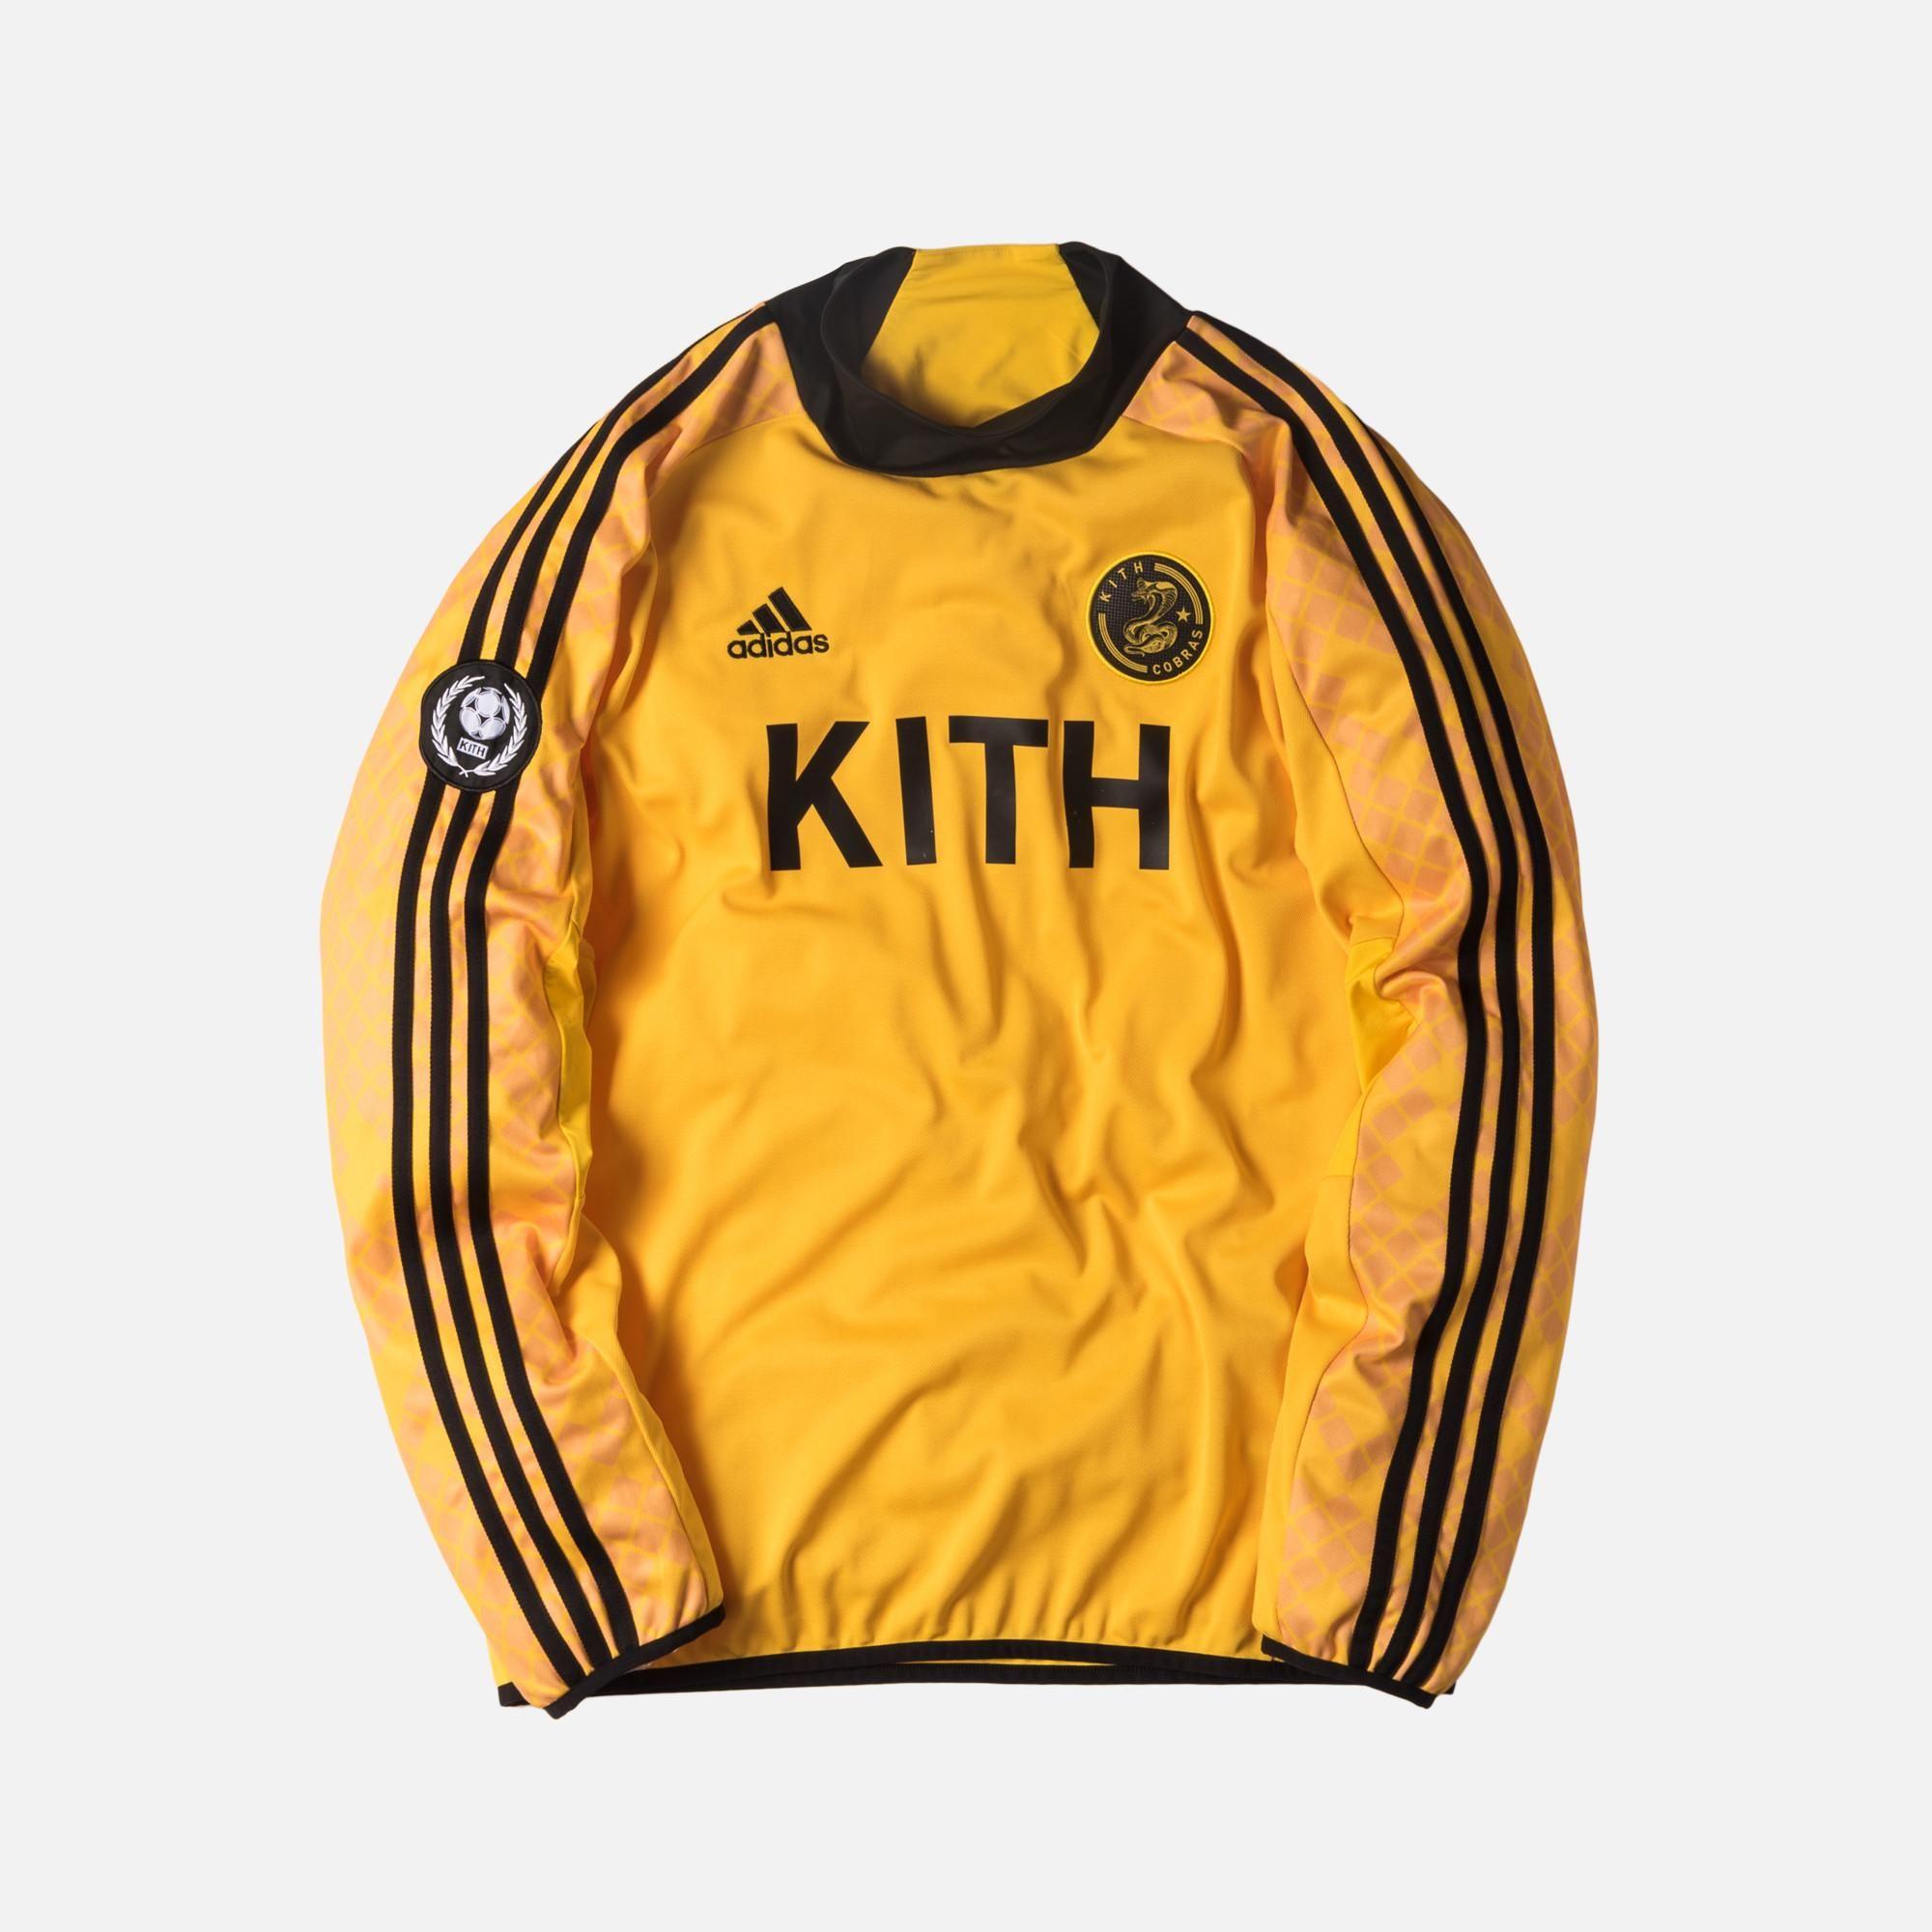 ceb88025127 Kith x adidas Soccer Goalie Jersey - Cobras | Fashion Killers ...